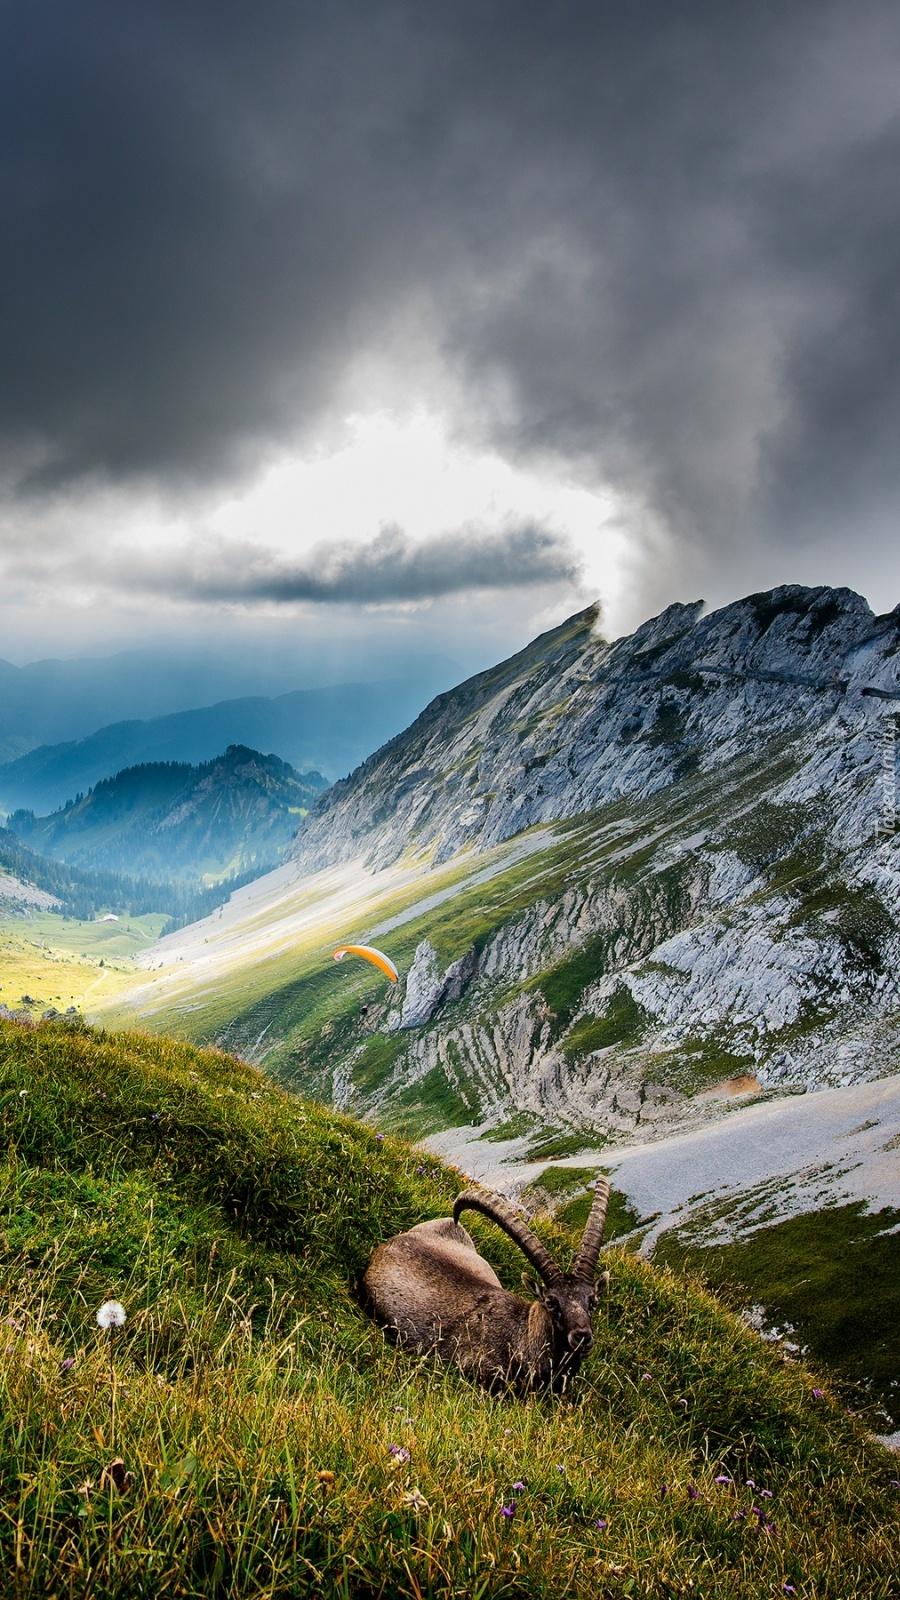 Kozioł na trawie w górach